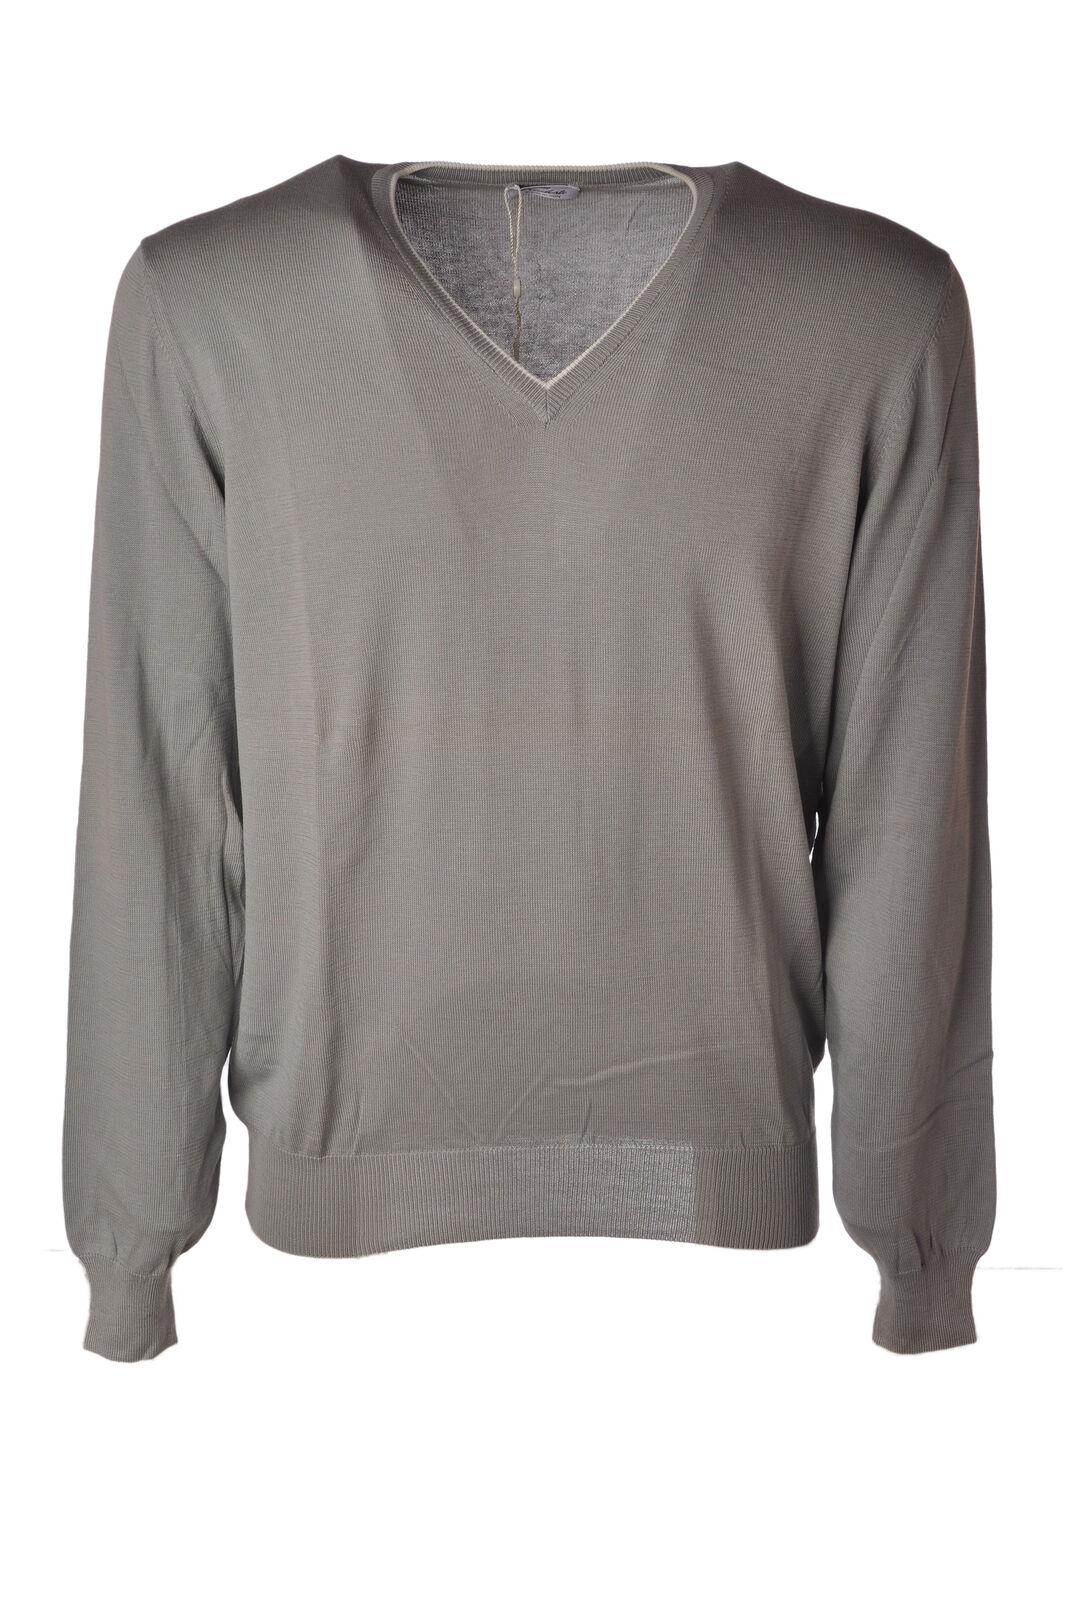 Viadeste  -  Sweaters - Male - Grau - 4678521A185541